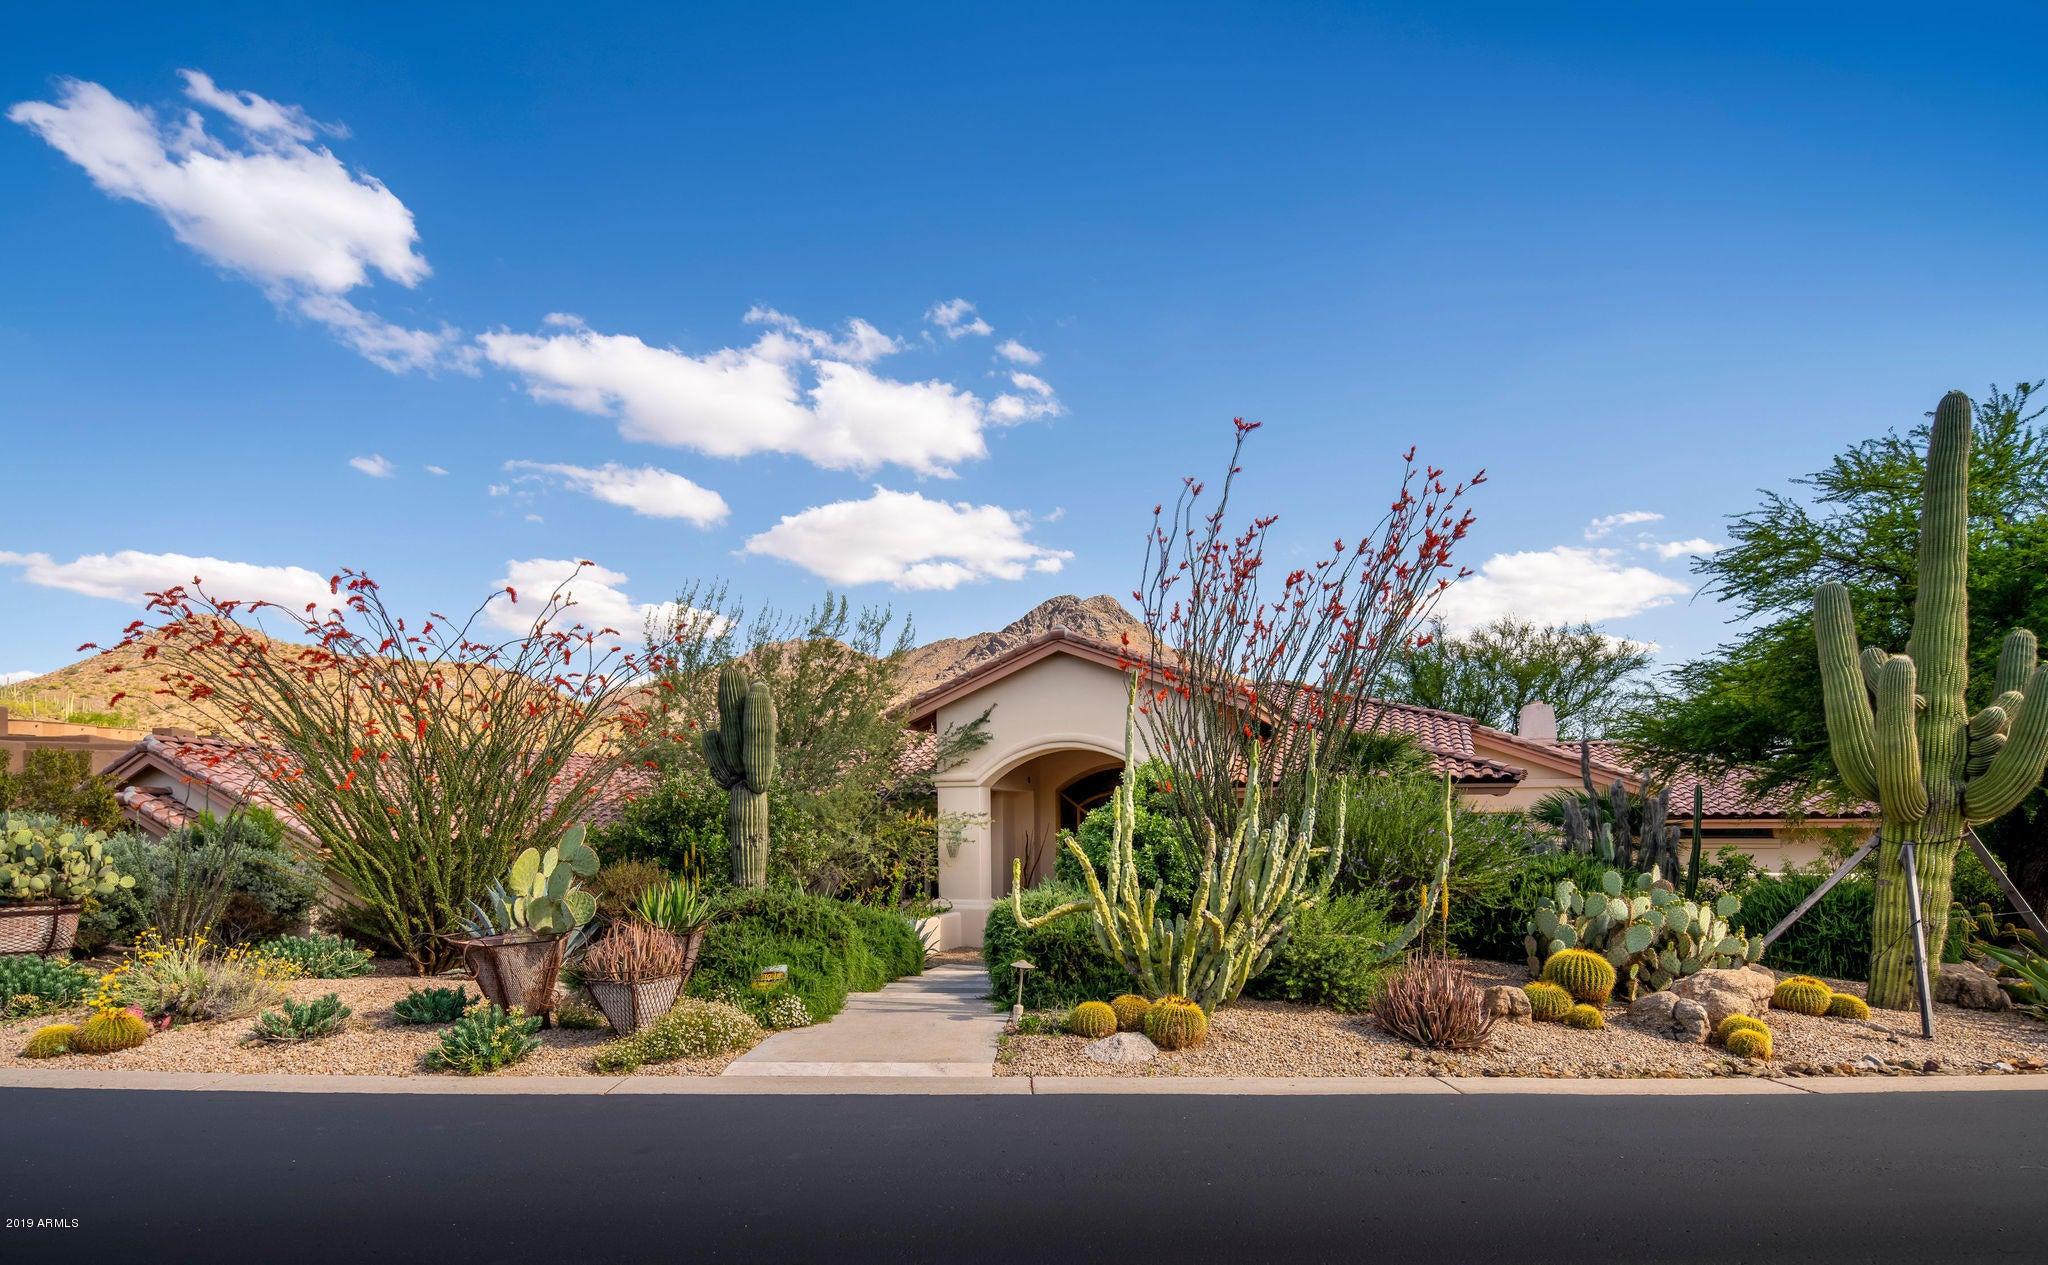 11315 E MARIPOSA GRANDE Drive, Scottsdale, AZ 85255